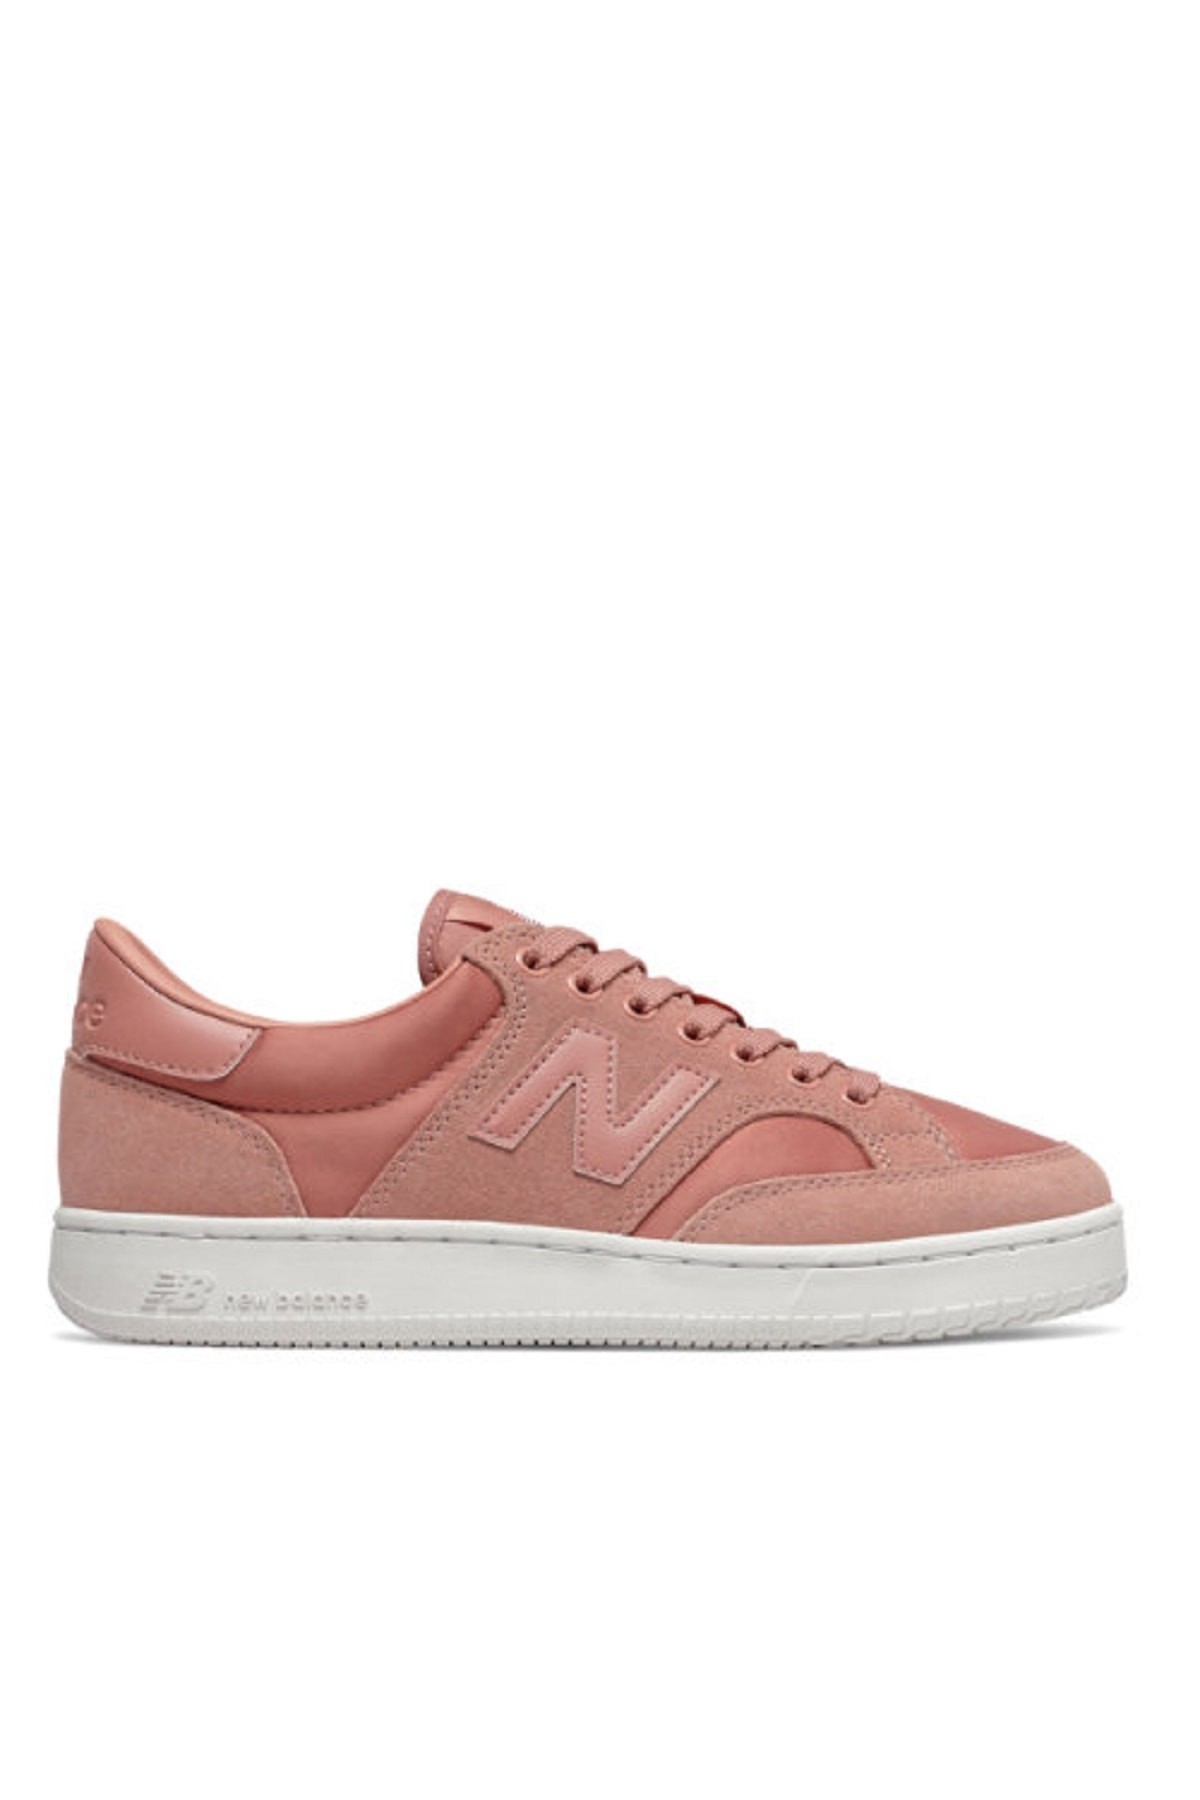 New Balance Kadın Sneaker - Lifestyle - PROWTCLC 0